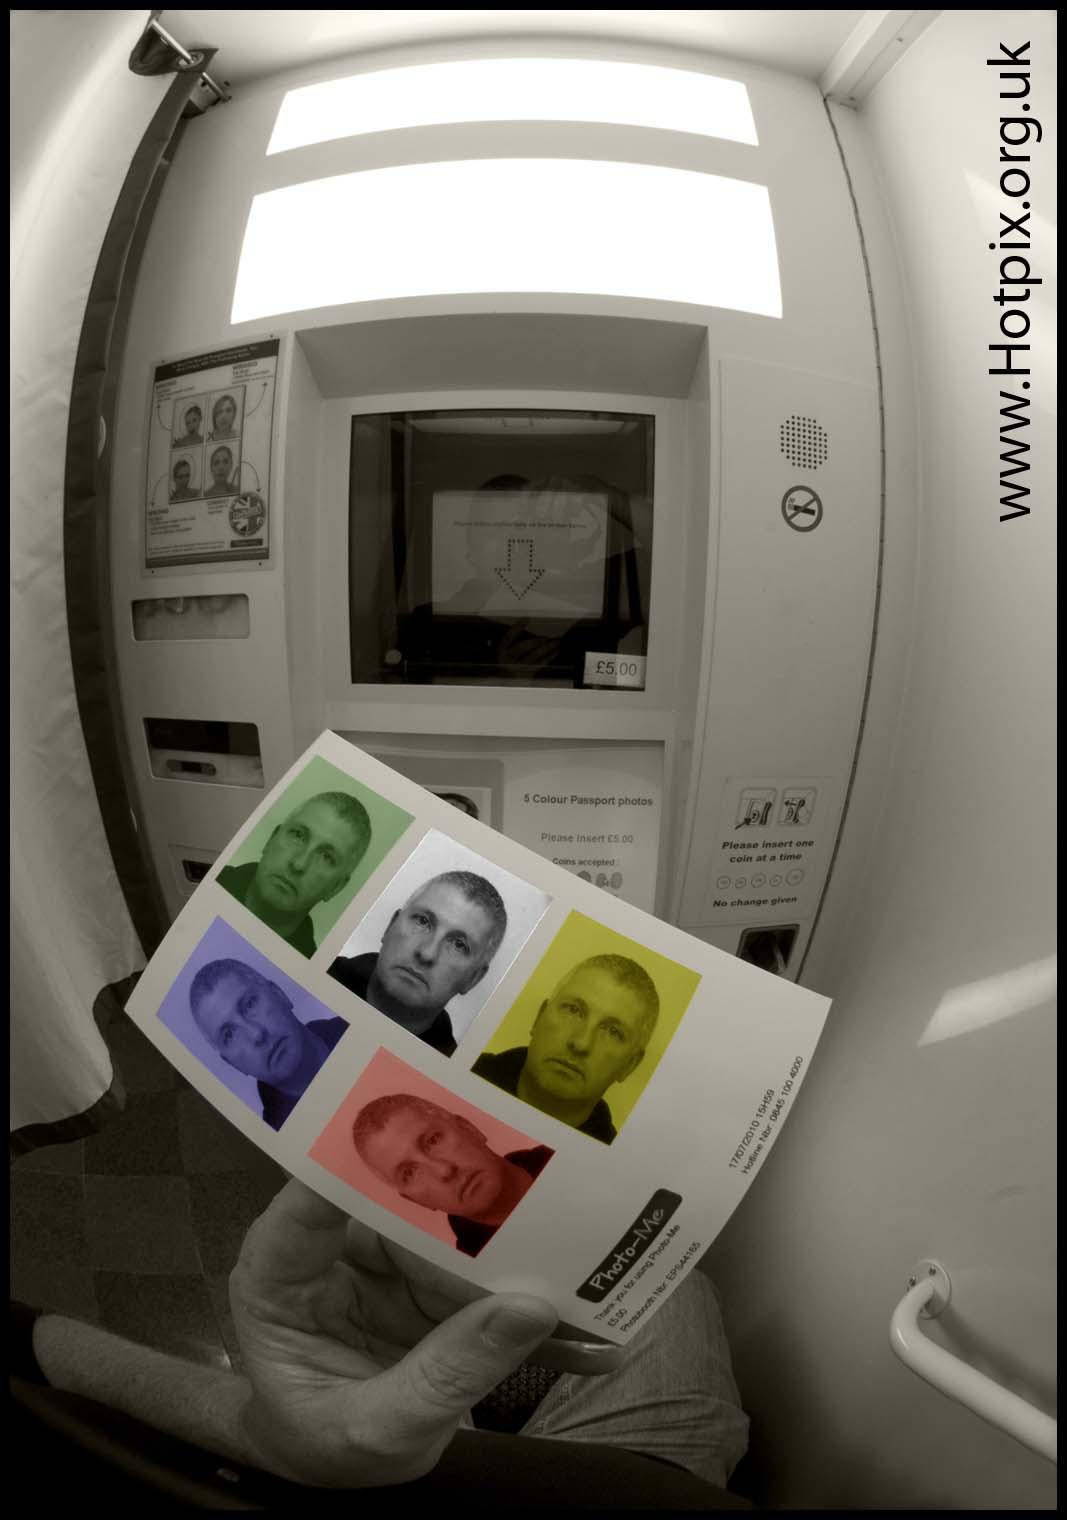 photome,photo,me,booth,uk,machine,picture,box,passport,image,colour,b/w,mixed,color,colores,tonysmith,music,tony,smith,hotpix,hot,pix,pics,pic,hotpics,warrington,golden,square,cheshire,england,ipod,tony smith photography,tdktony,tdk,tdktonysmith,#tonysmithhotpix,#tonysmithotpix